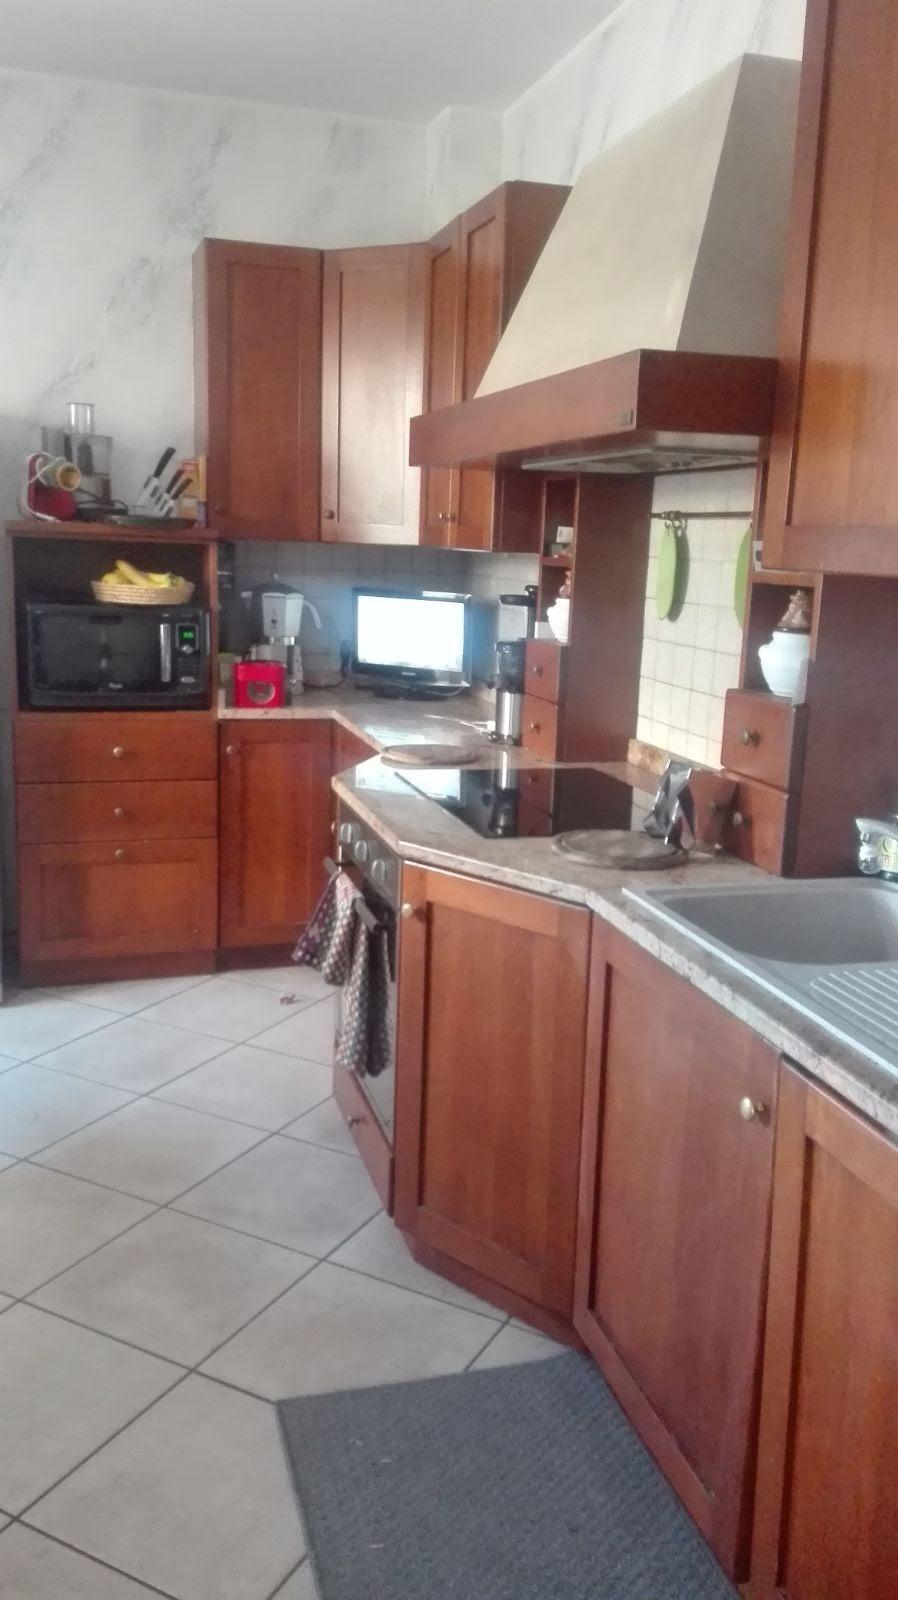 Good questa era la cucina prima del restyling una cucina - Come rinnovare la cucina ...